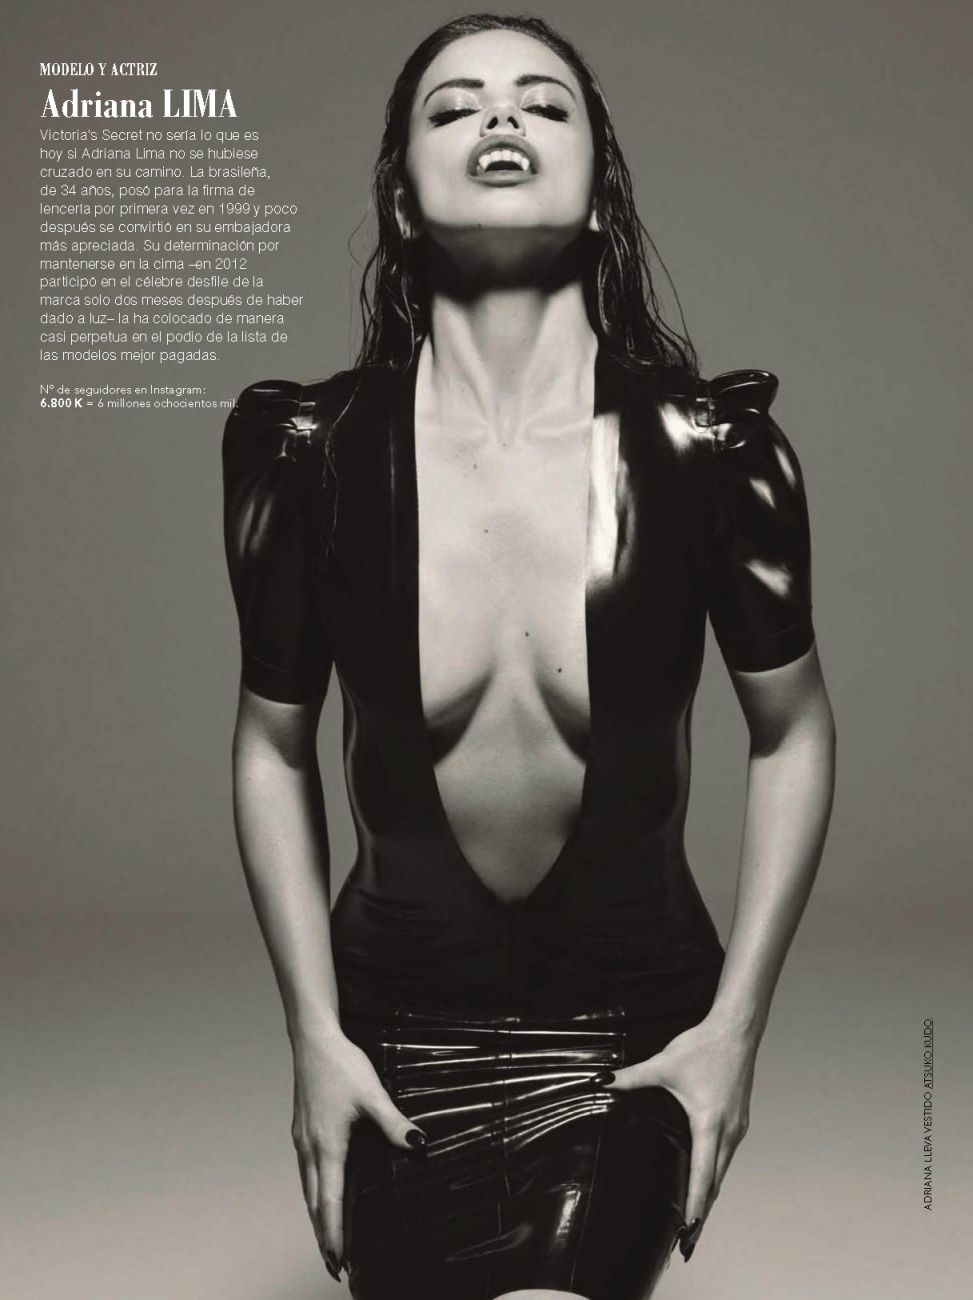 Adriana-Lima-Cleavage-2